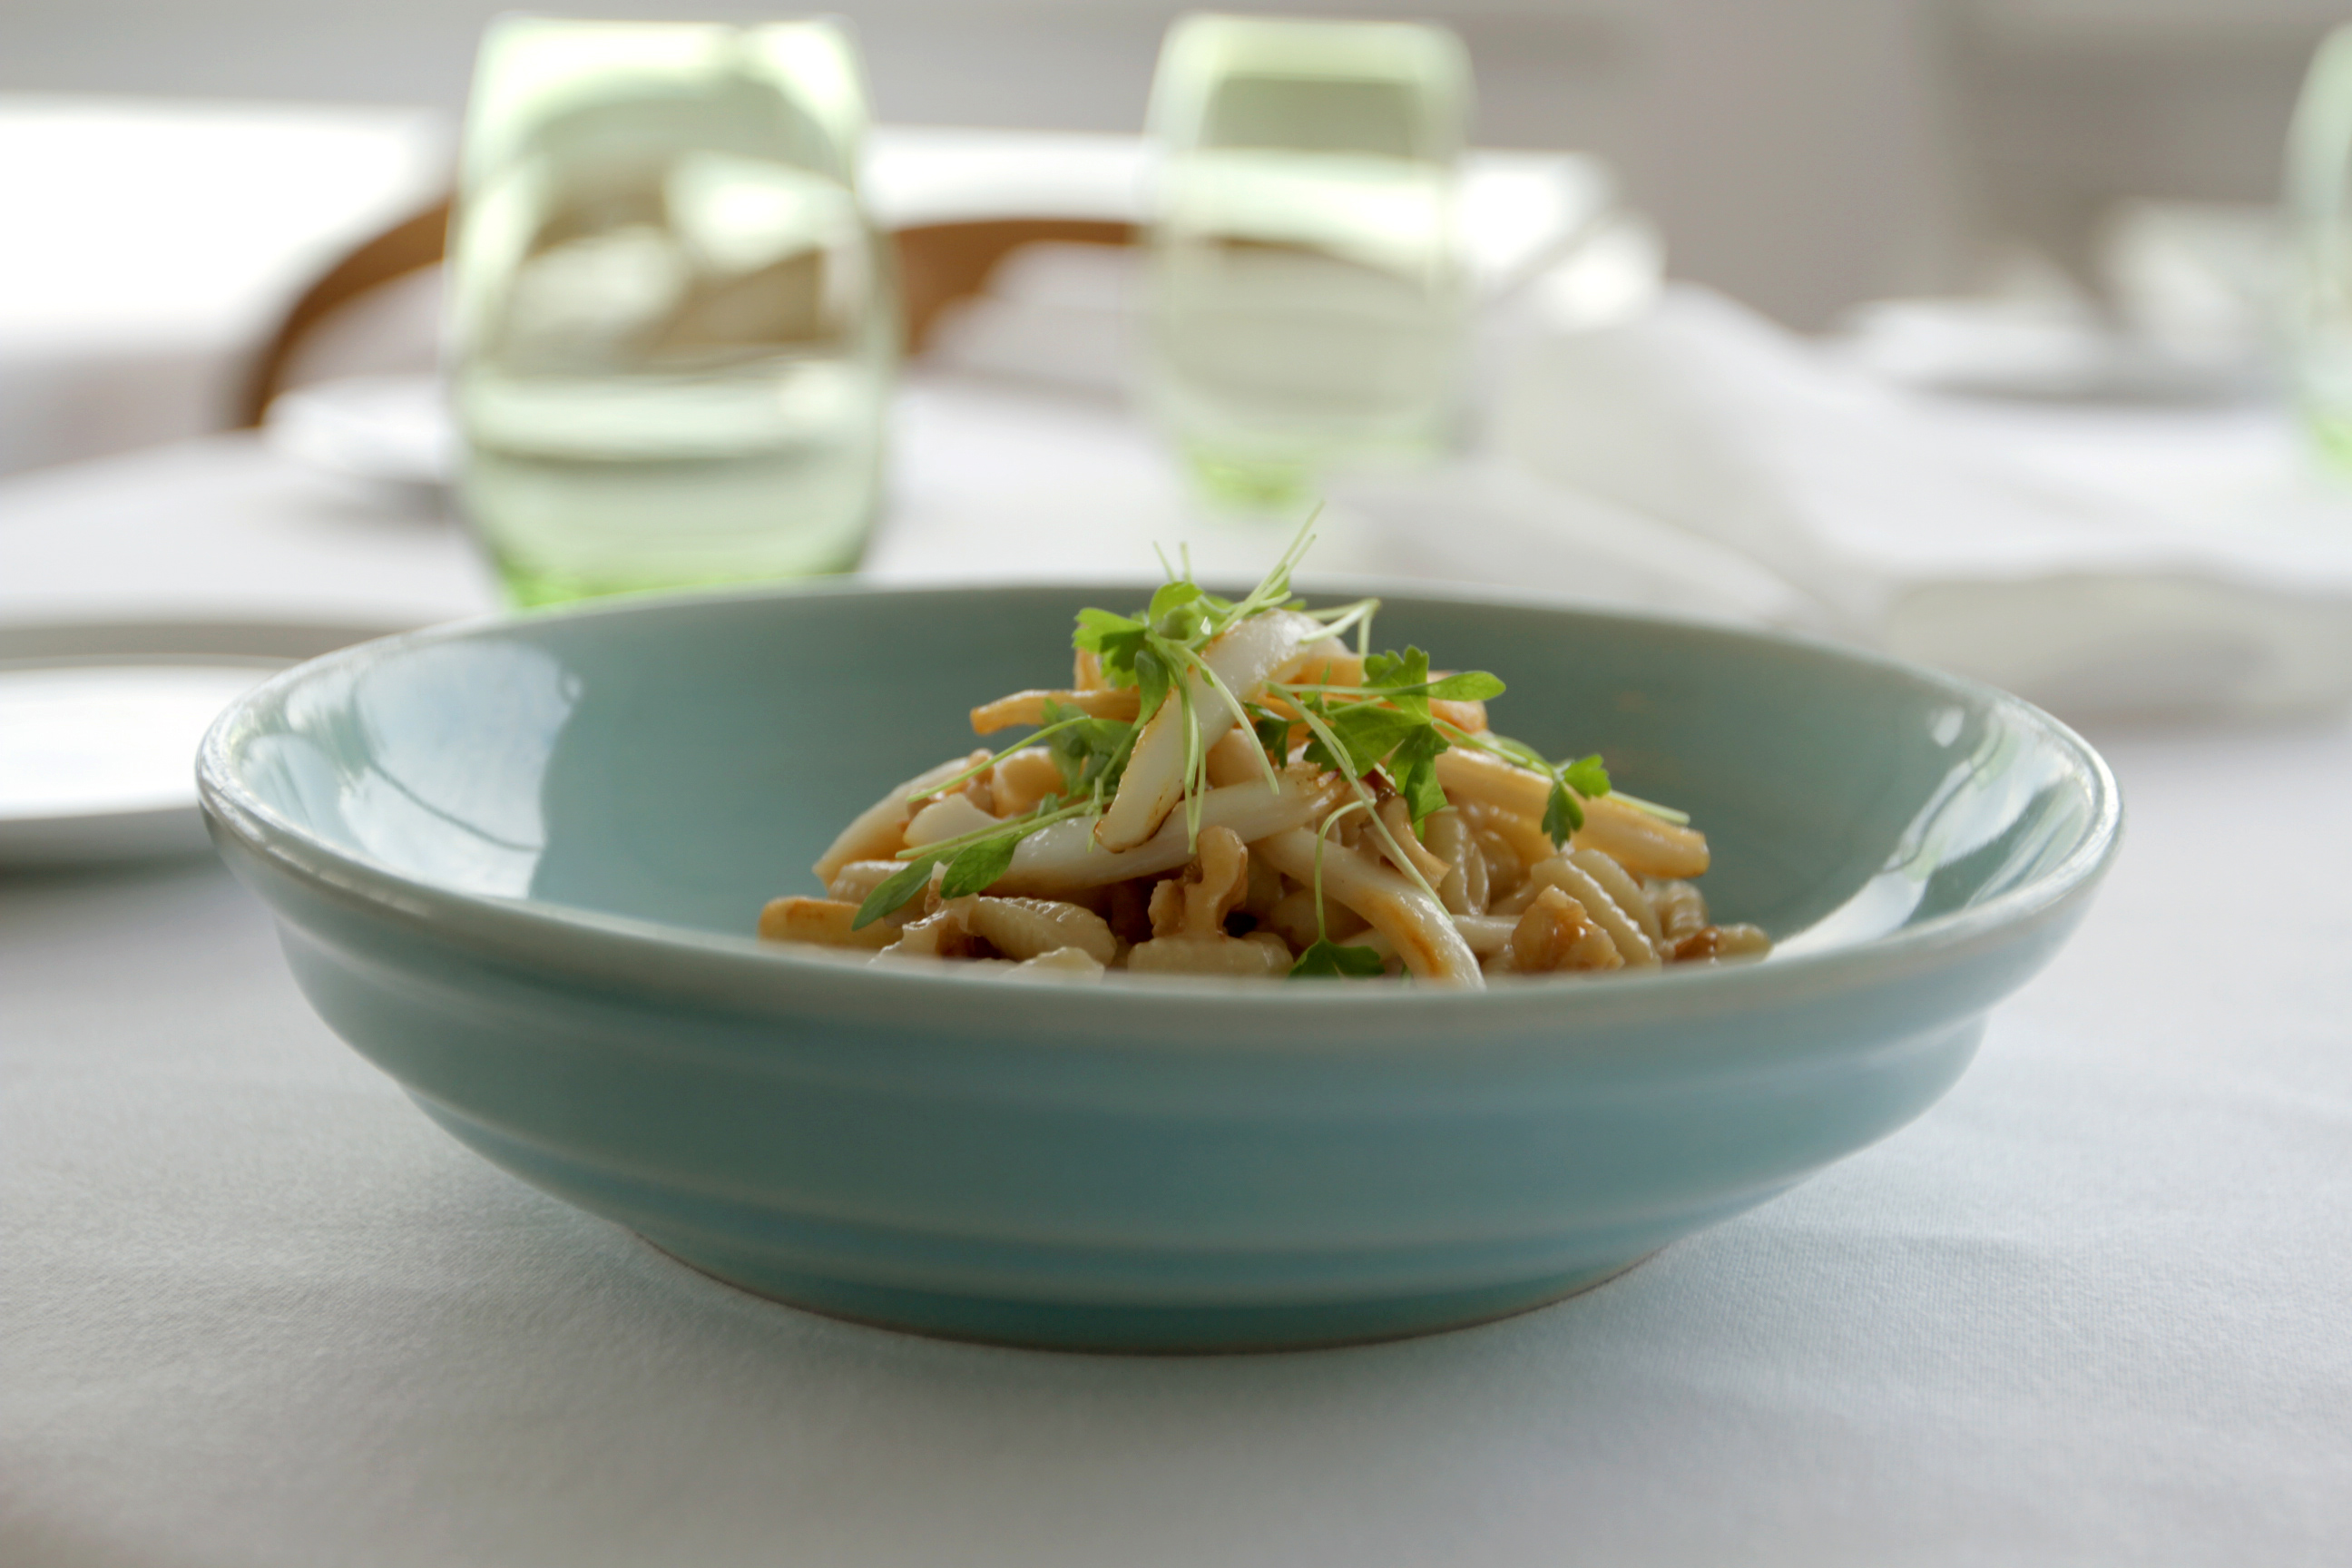 http://www.foodthinkers.com.au/images/easyblog_images/456/PiluBMO700pasta3.jpg